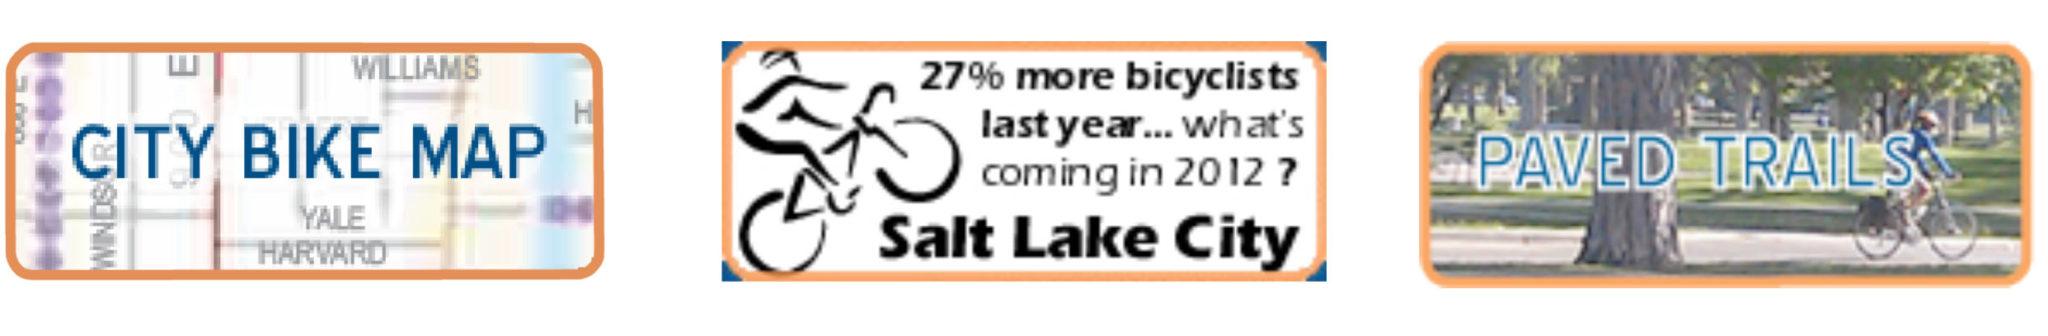 "Biking around town – Salt Lake City Bike Map and ""GREENbike"" Bike Share"